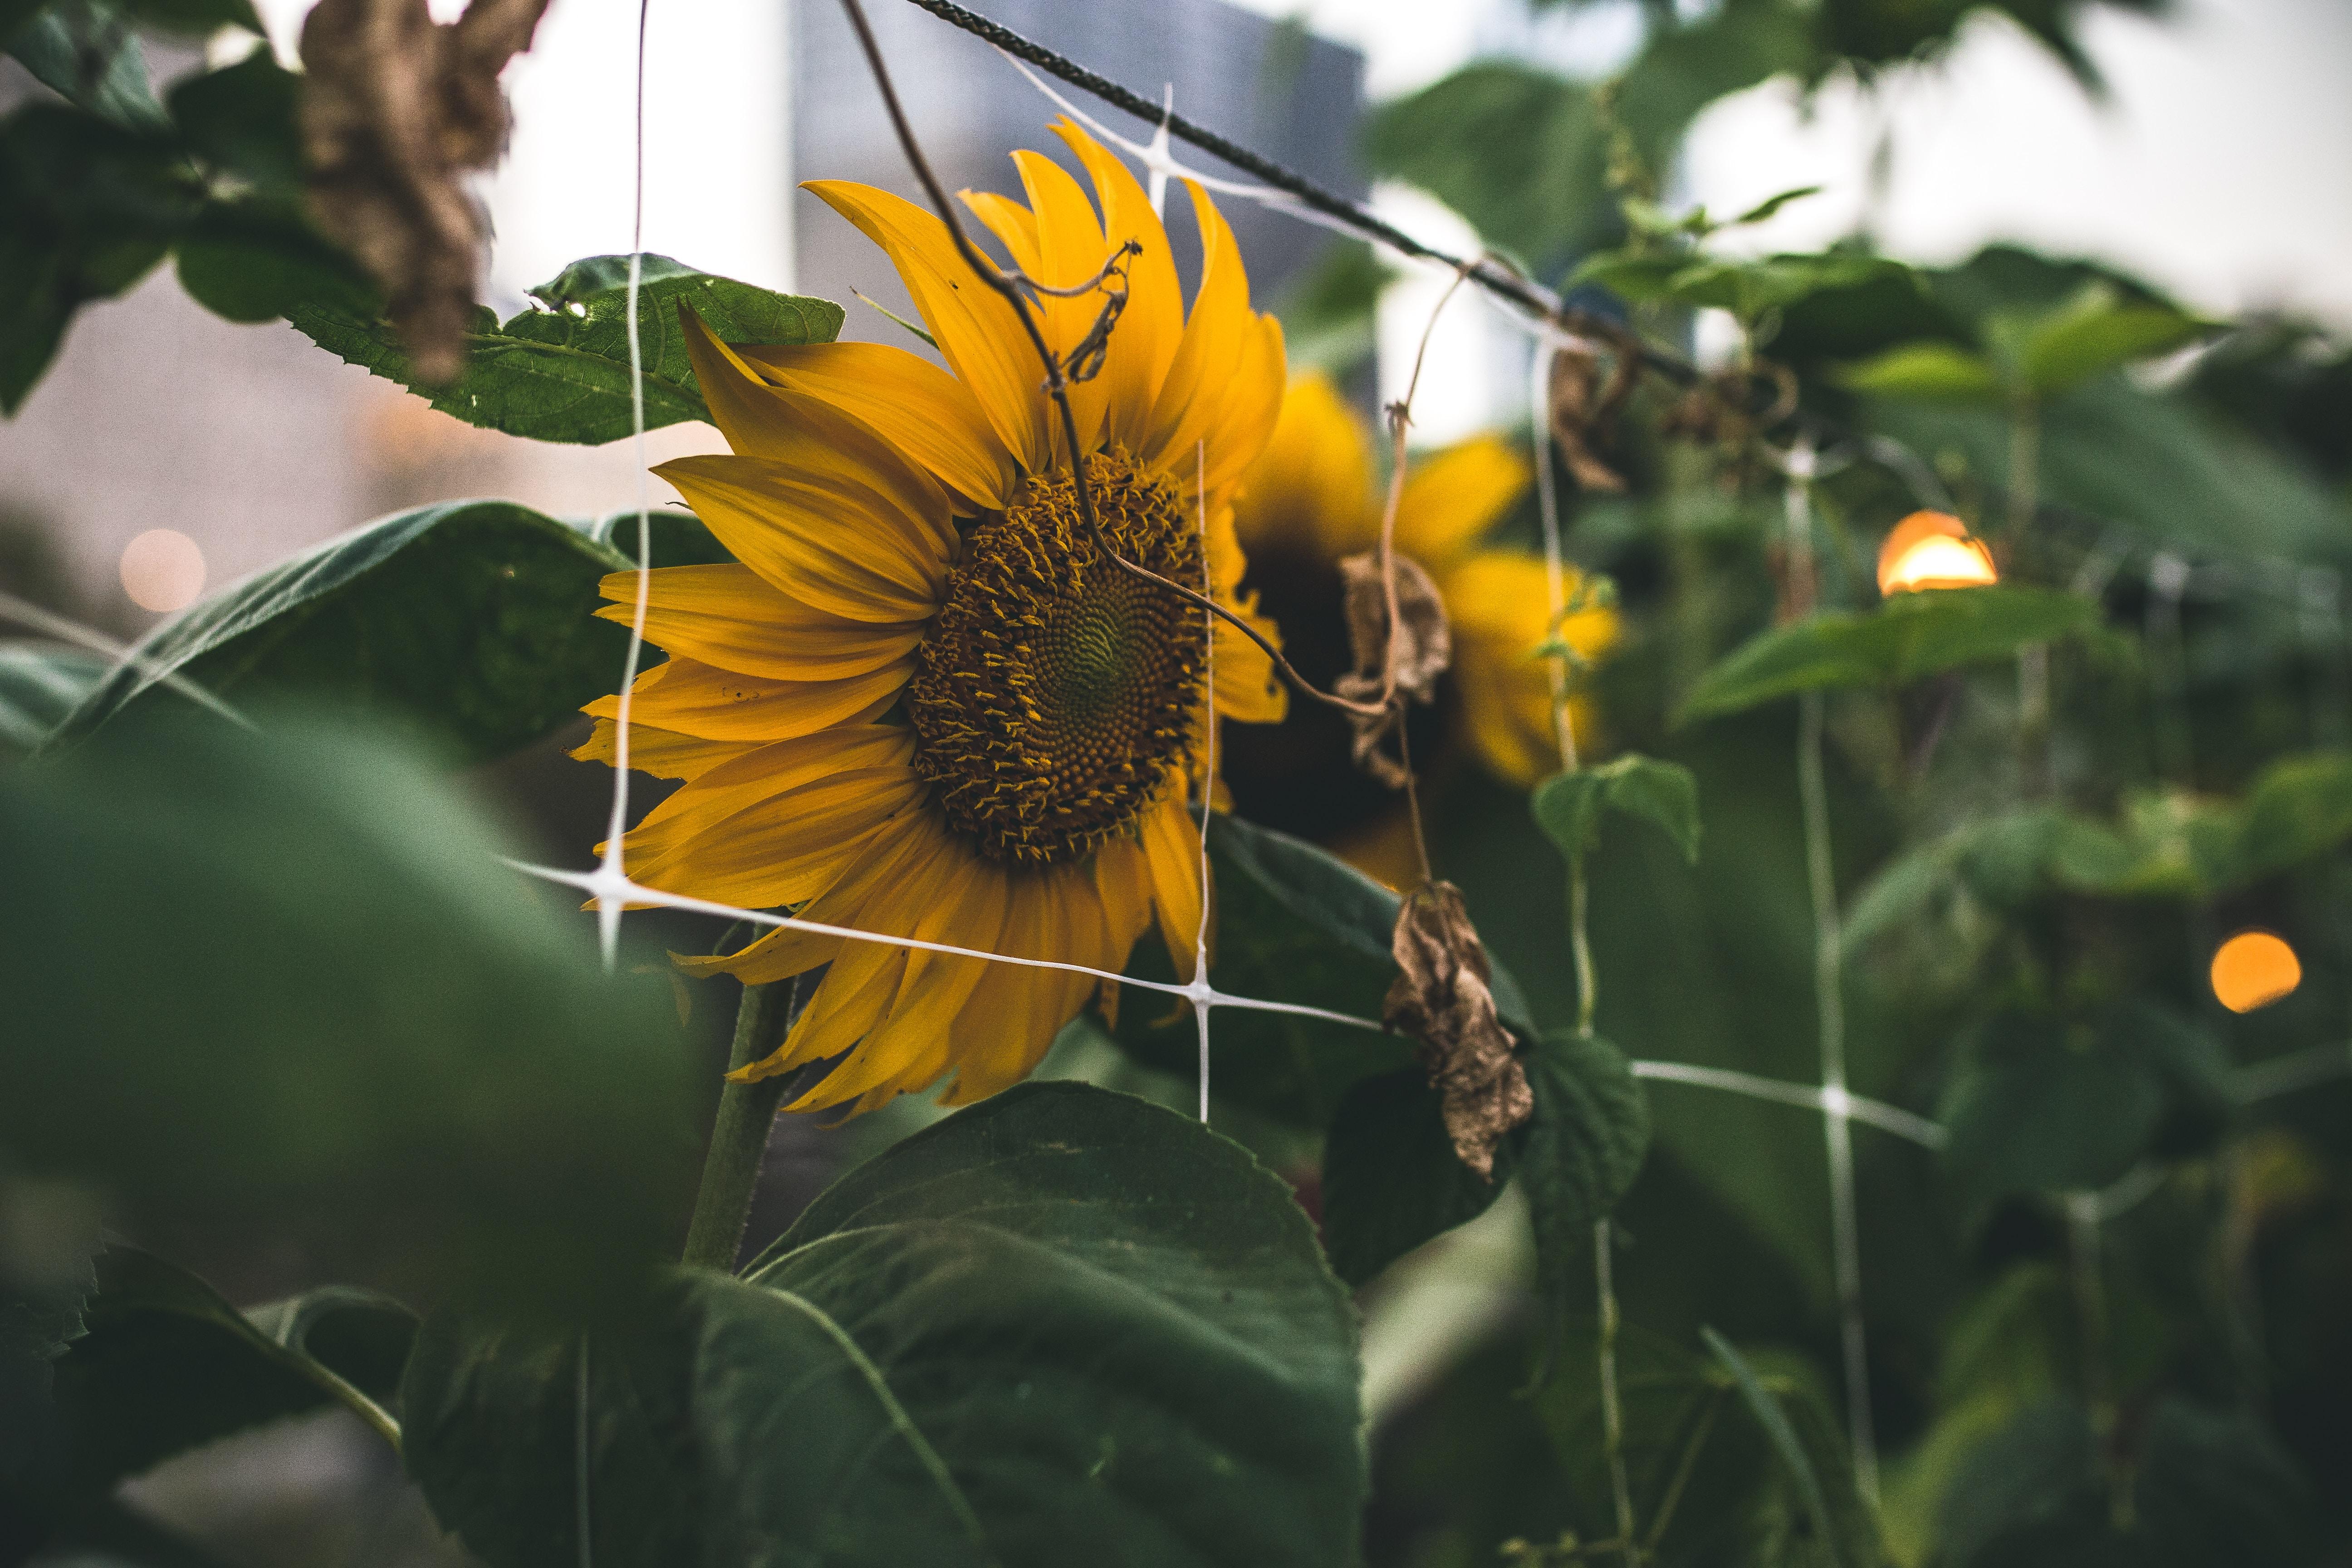 sunflower shallow focus photography